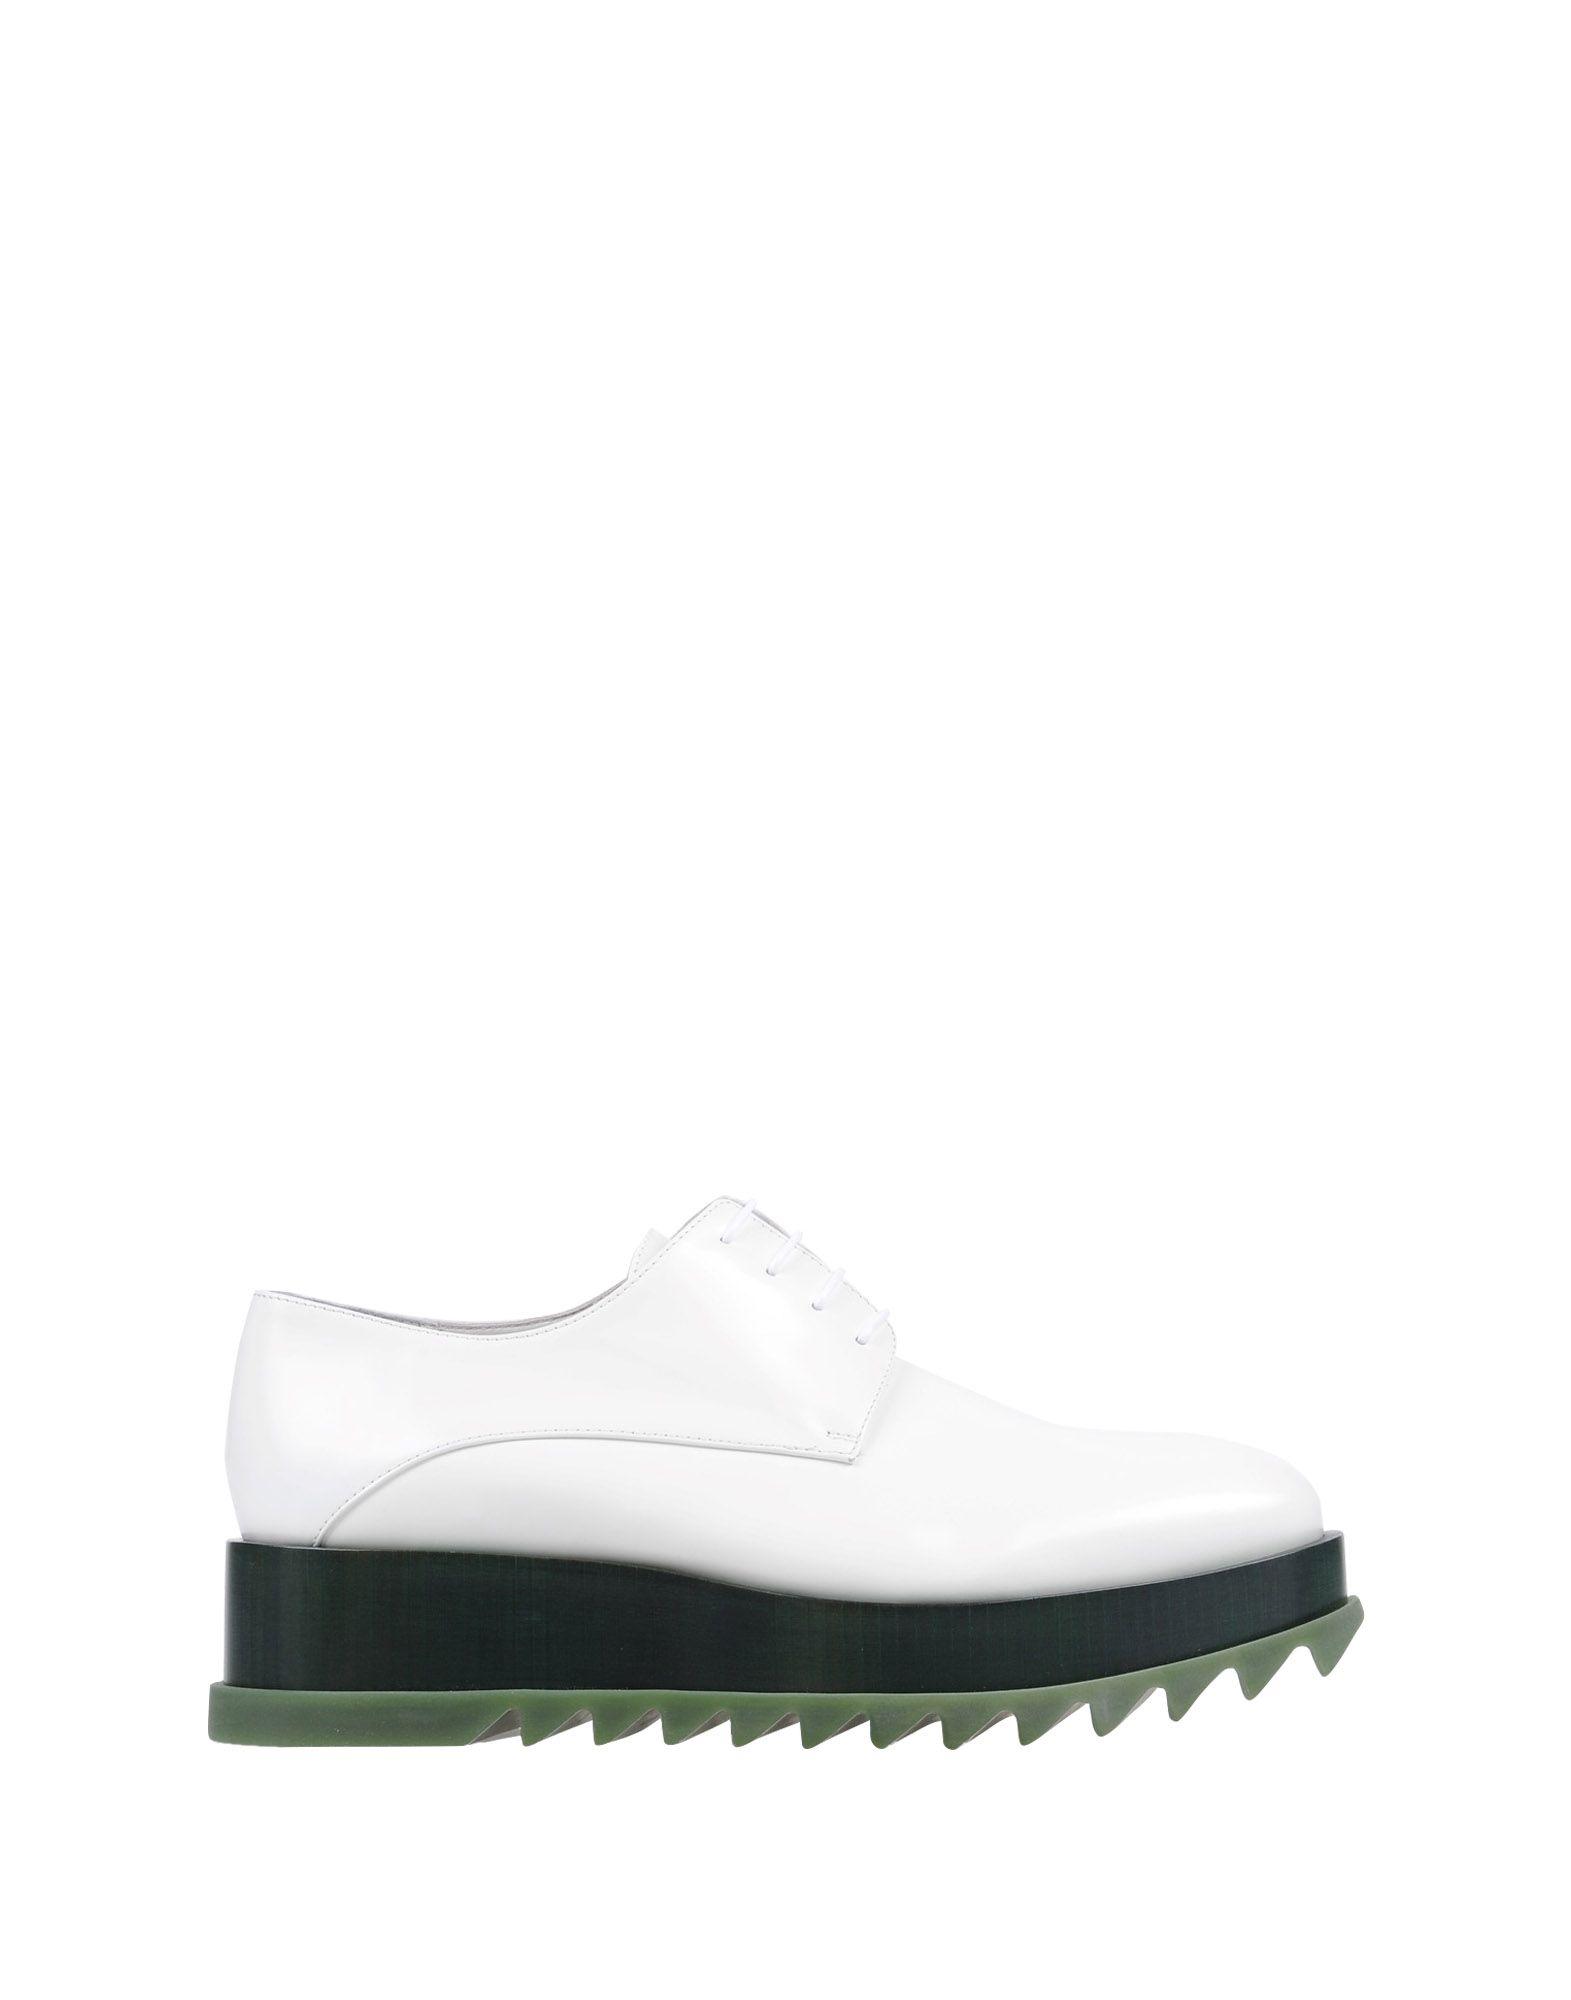 CHAUSSURES - Chaussures à lacetsJil Sander mWkehSd